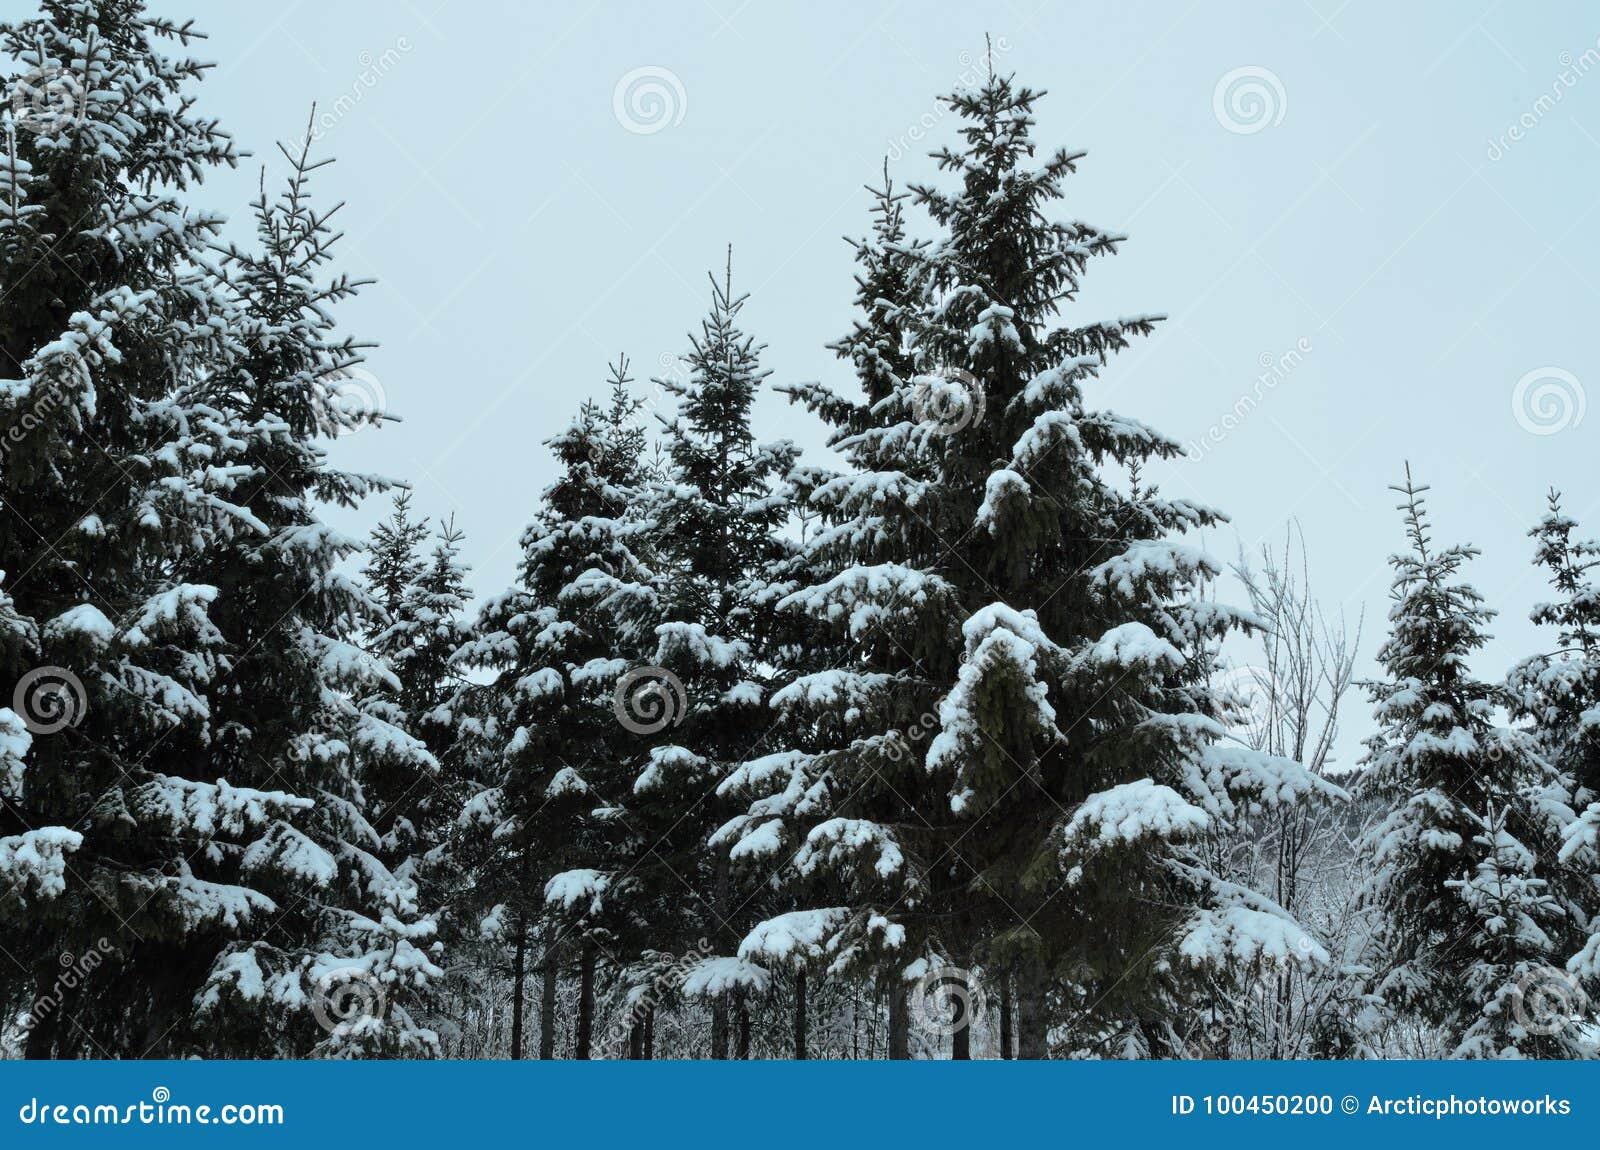 spruce tree snow - photo #43